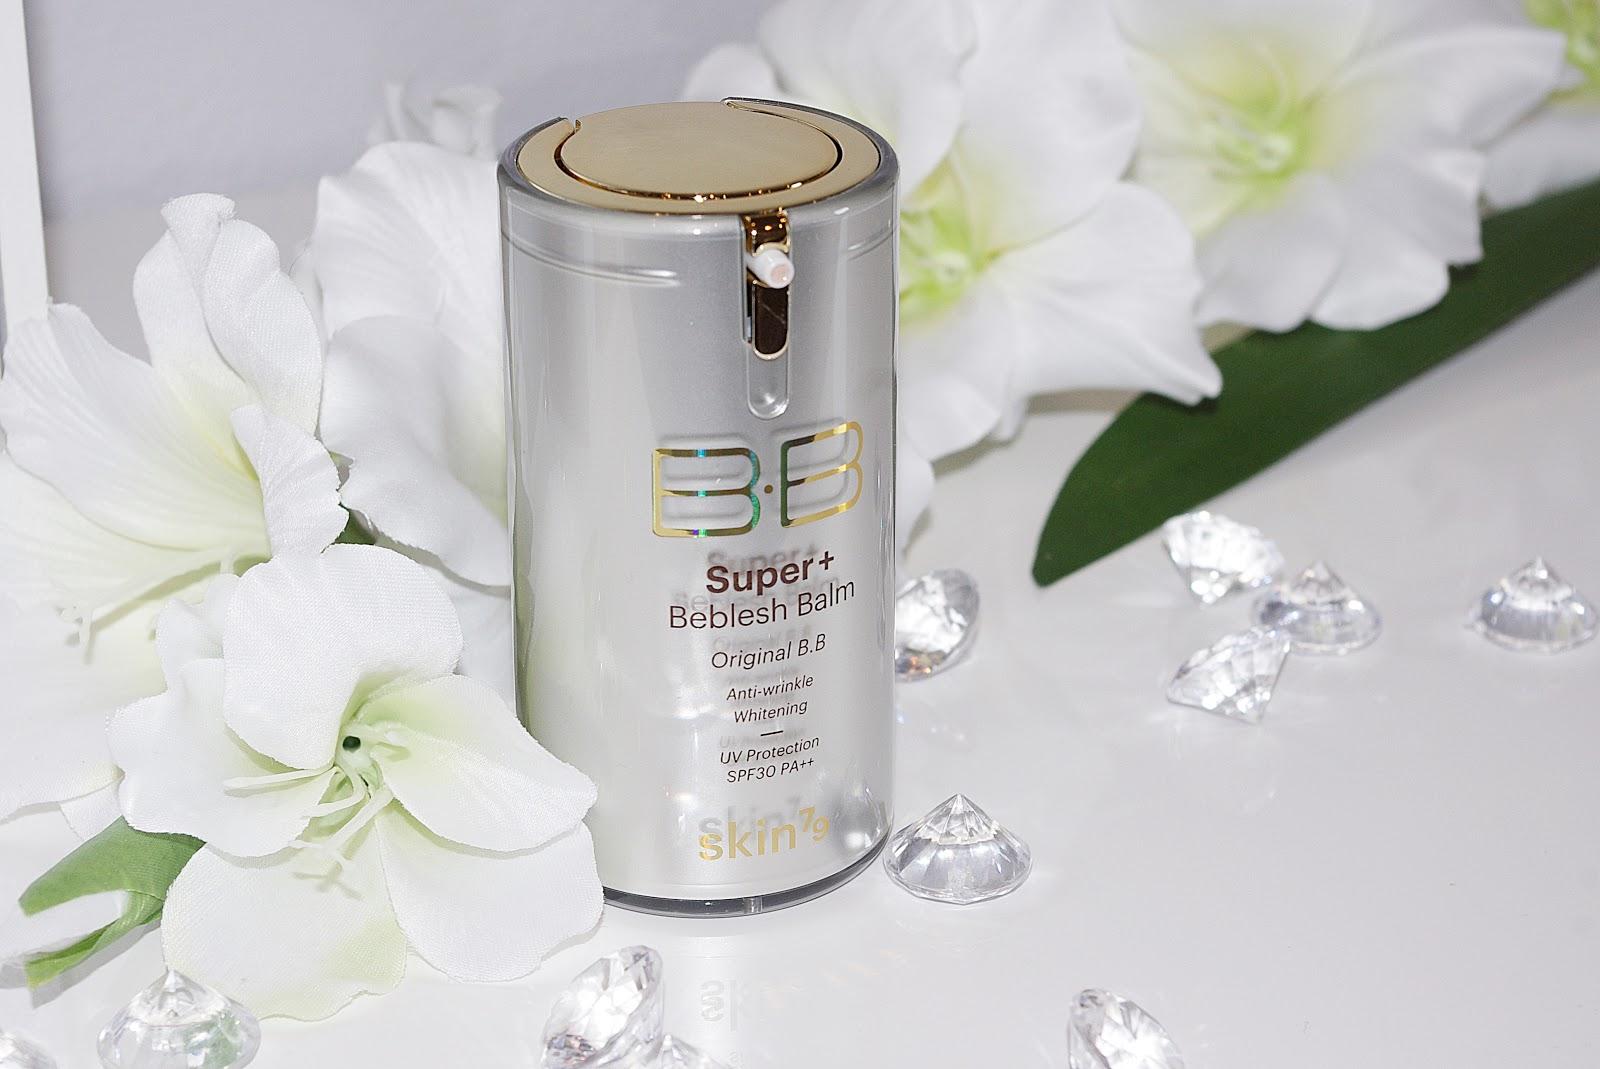 Skin79 Super+ Beblesh Balm Cream Vip Gold